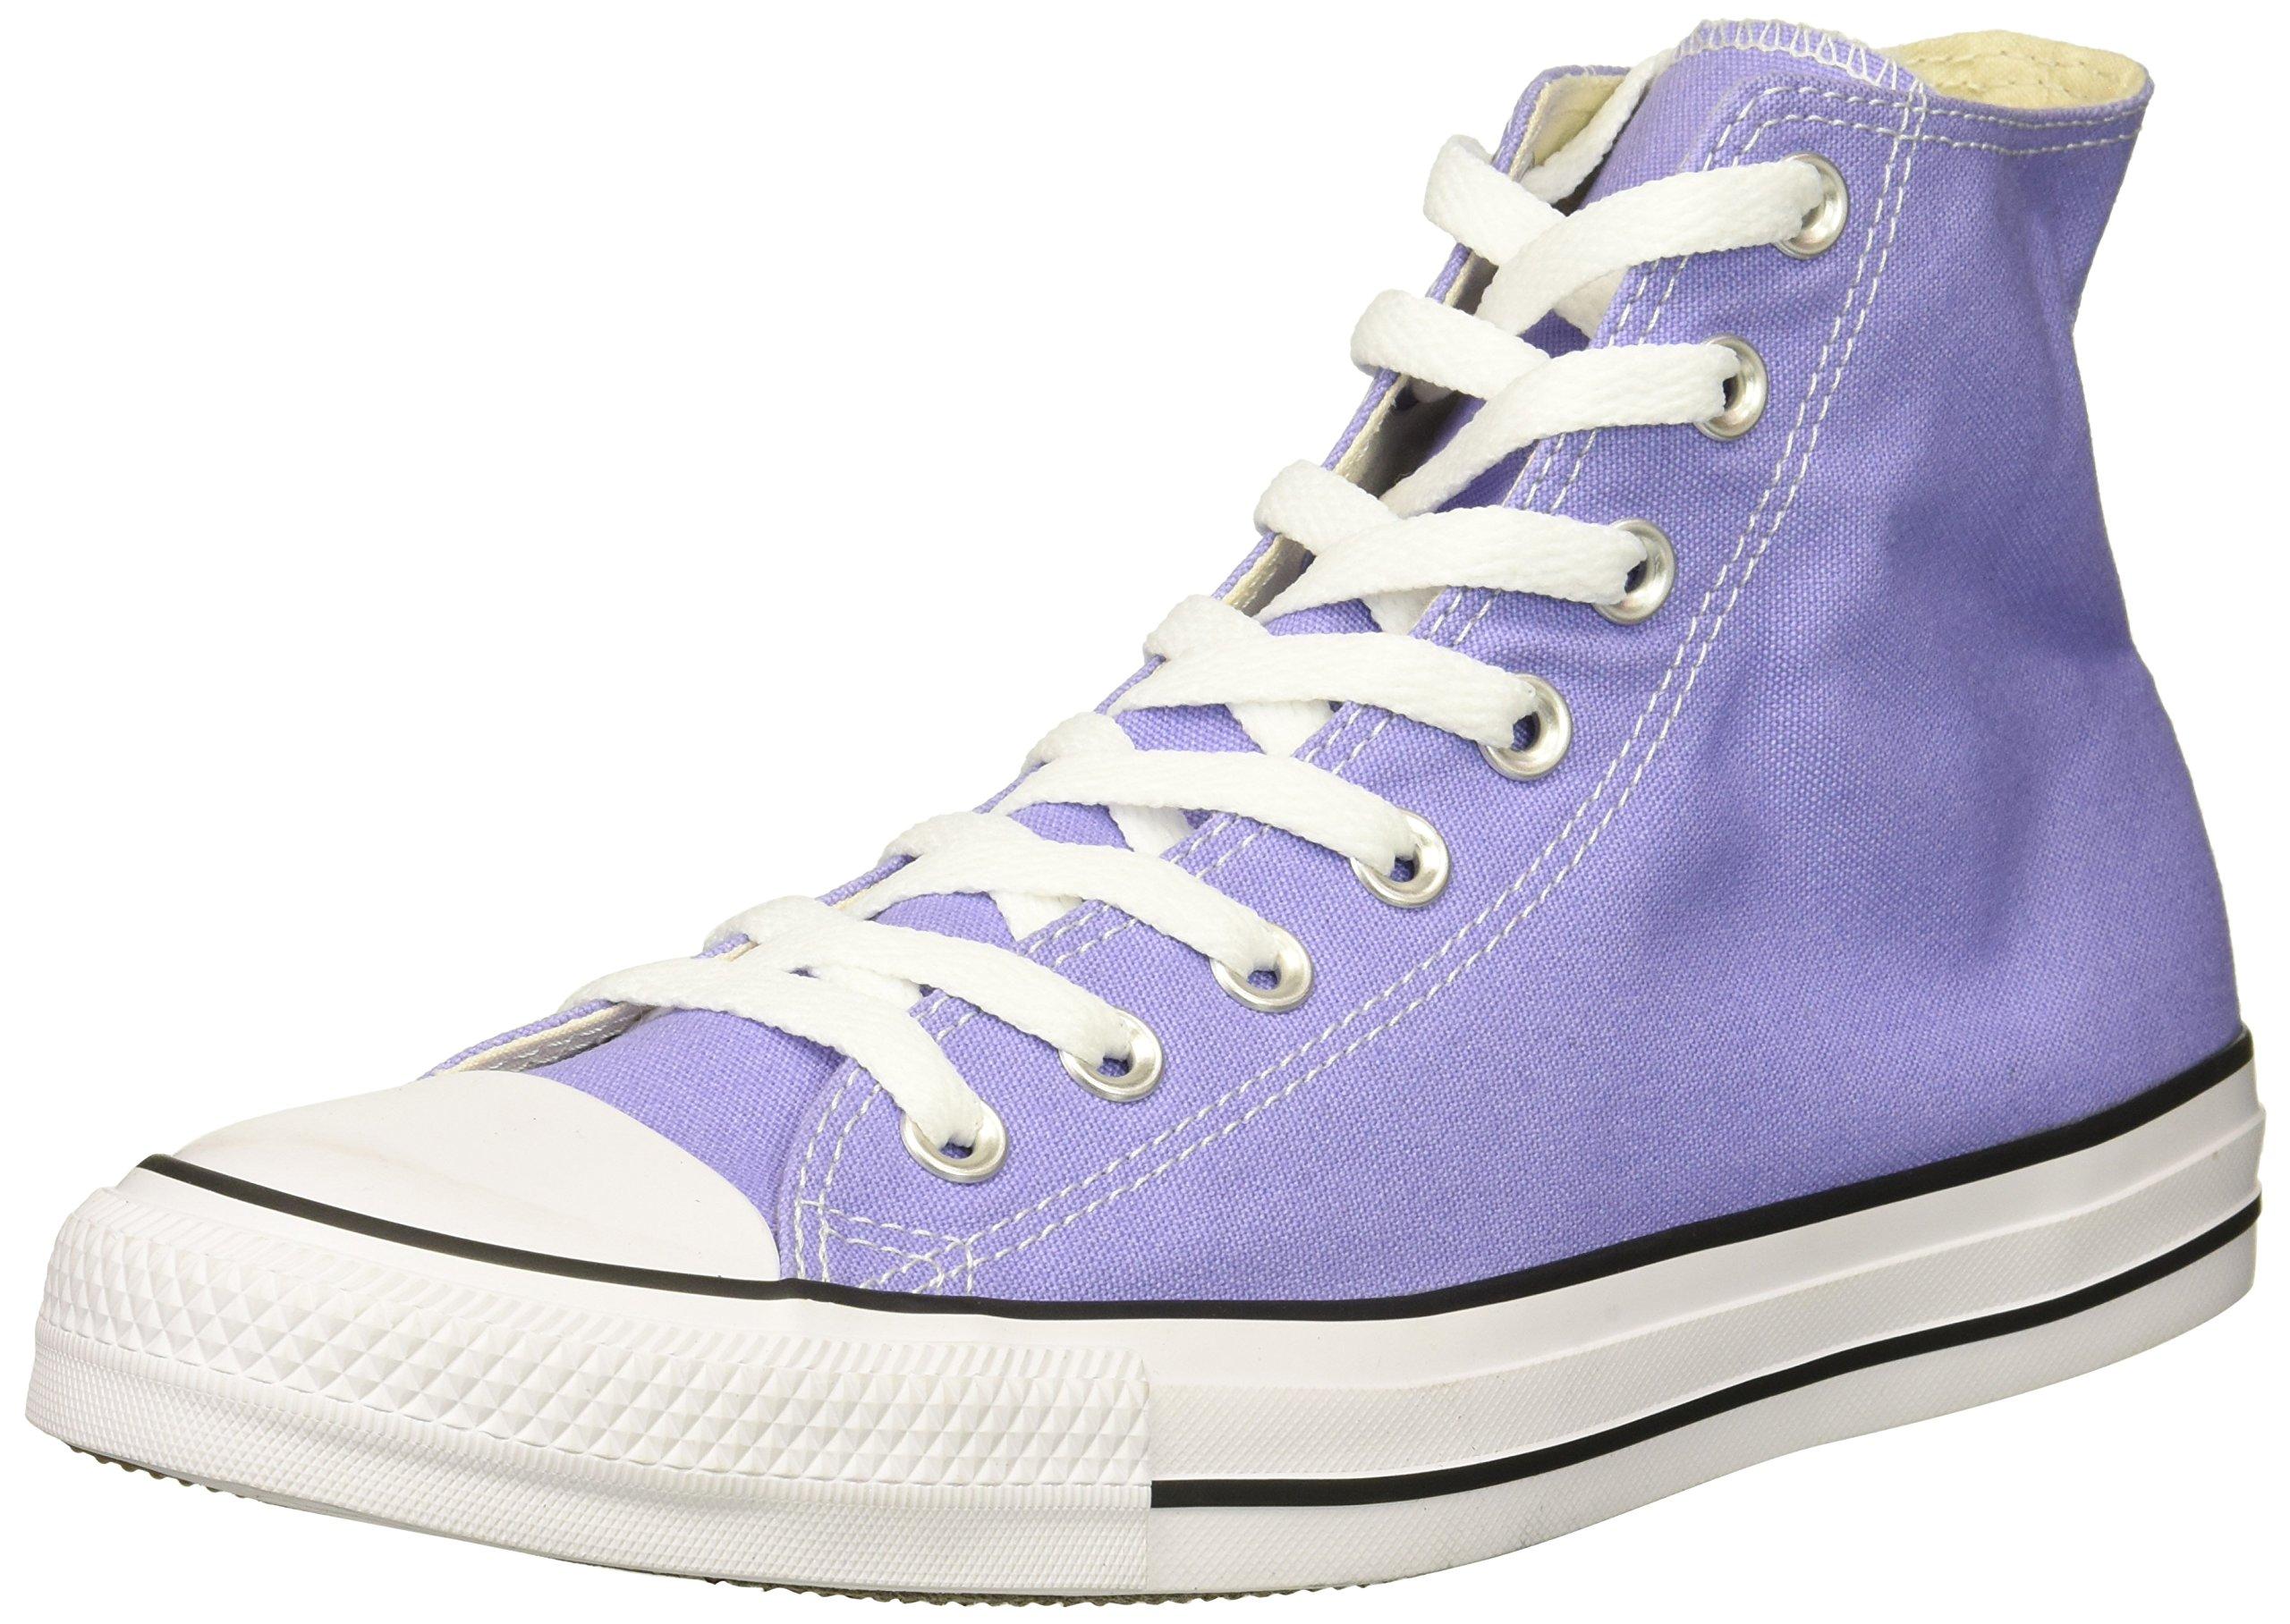 9e2d28a3c96 Galleon - Converse Chuck Taylor All Star Seasonal Canvas High Top Sneaker